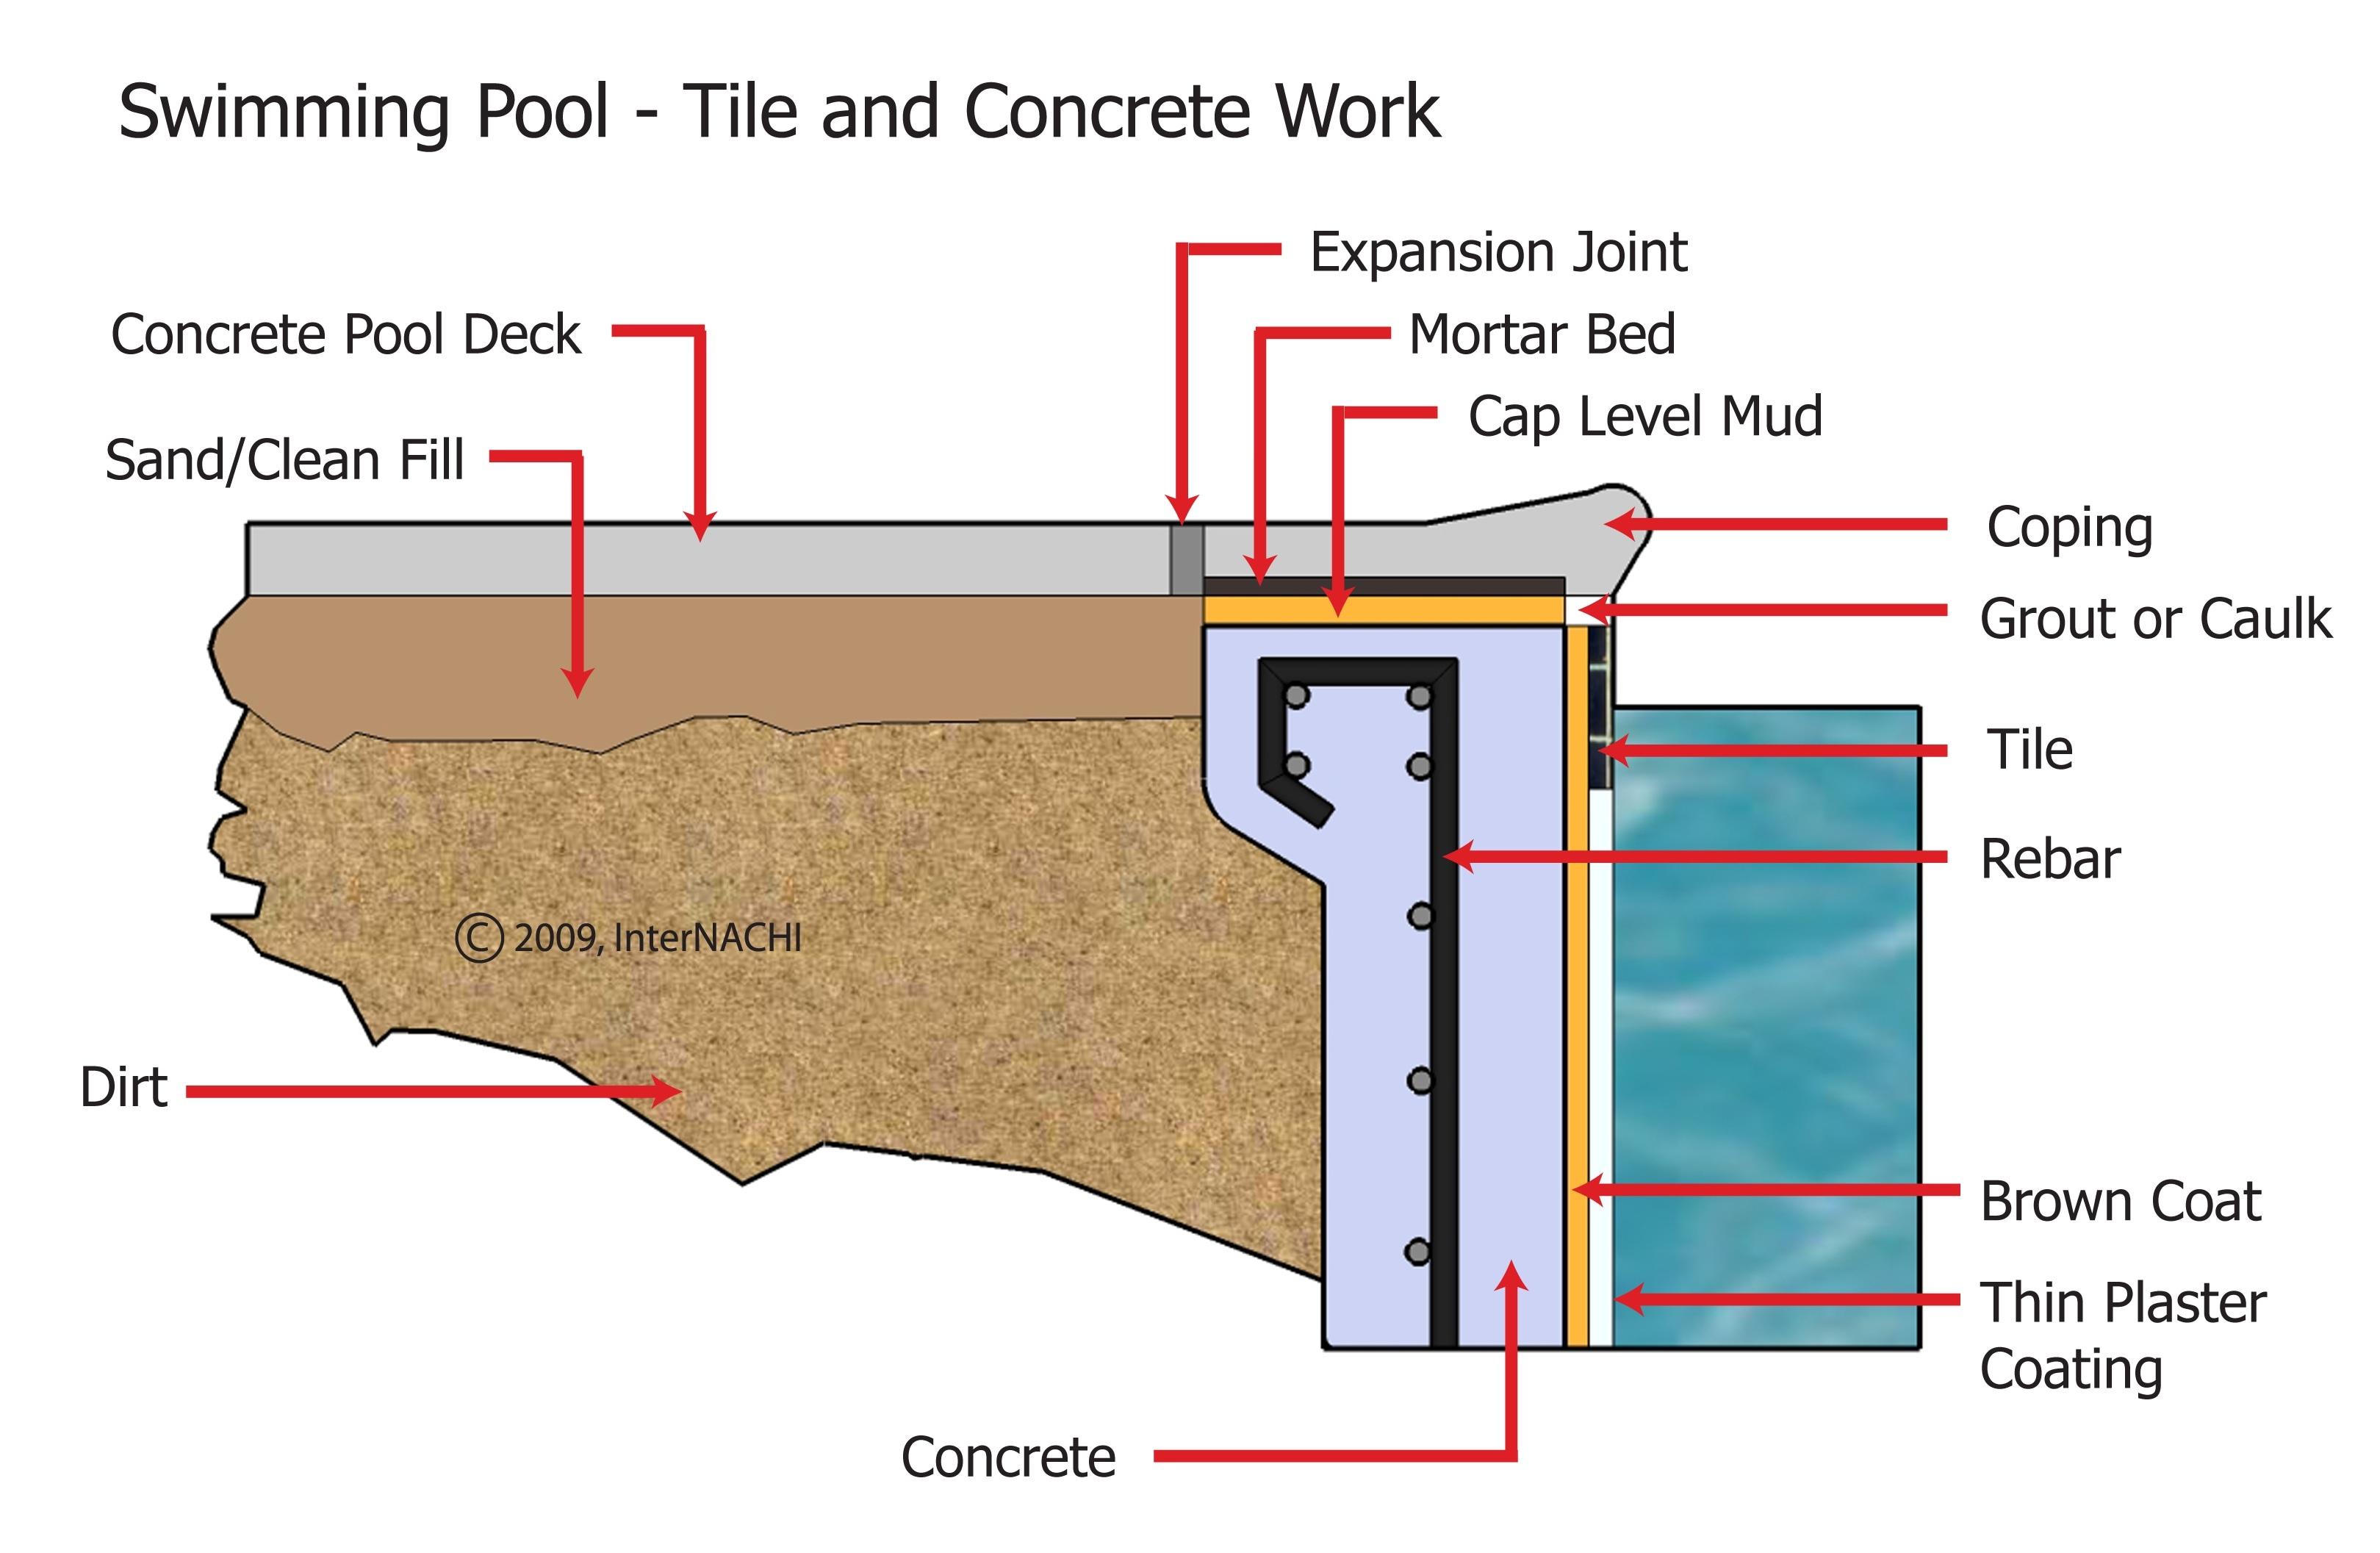 Swimming pool terminology.